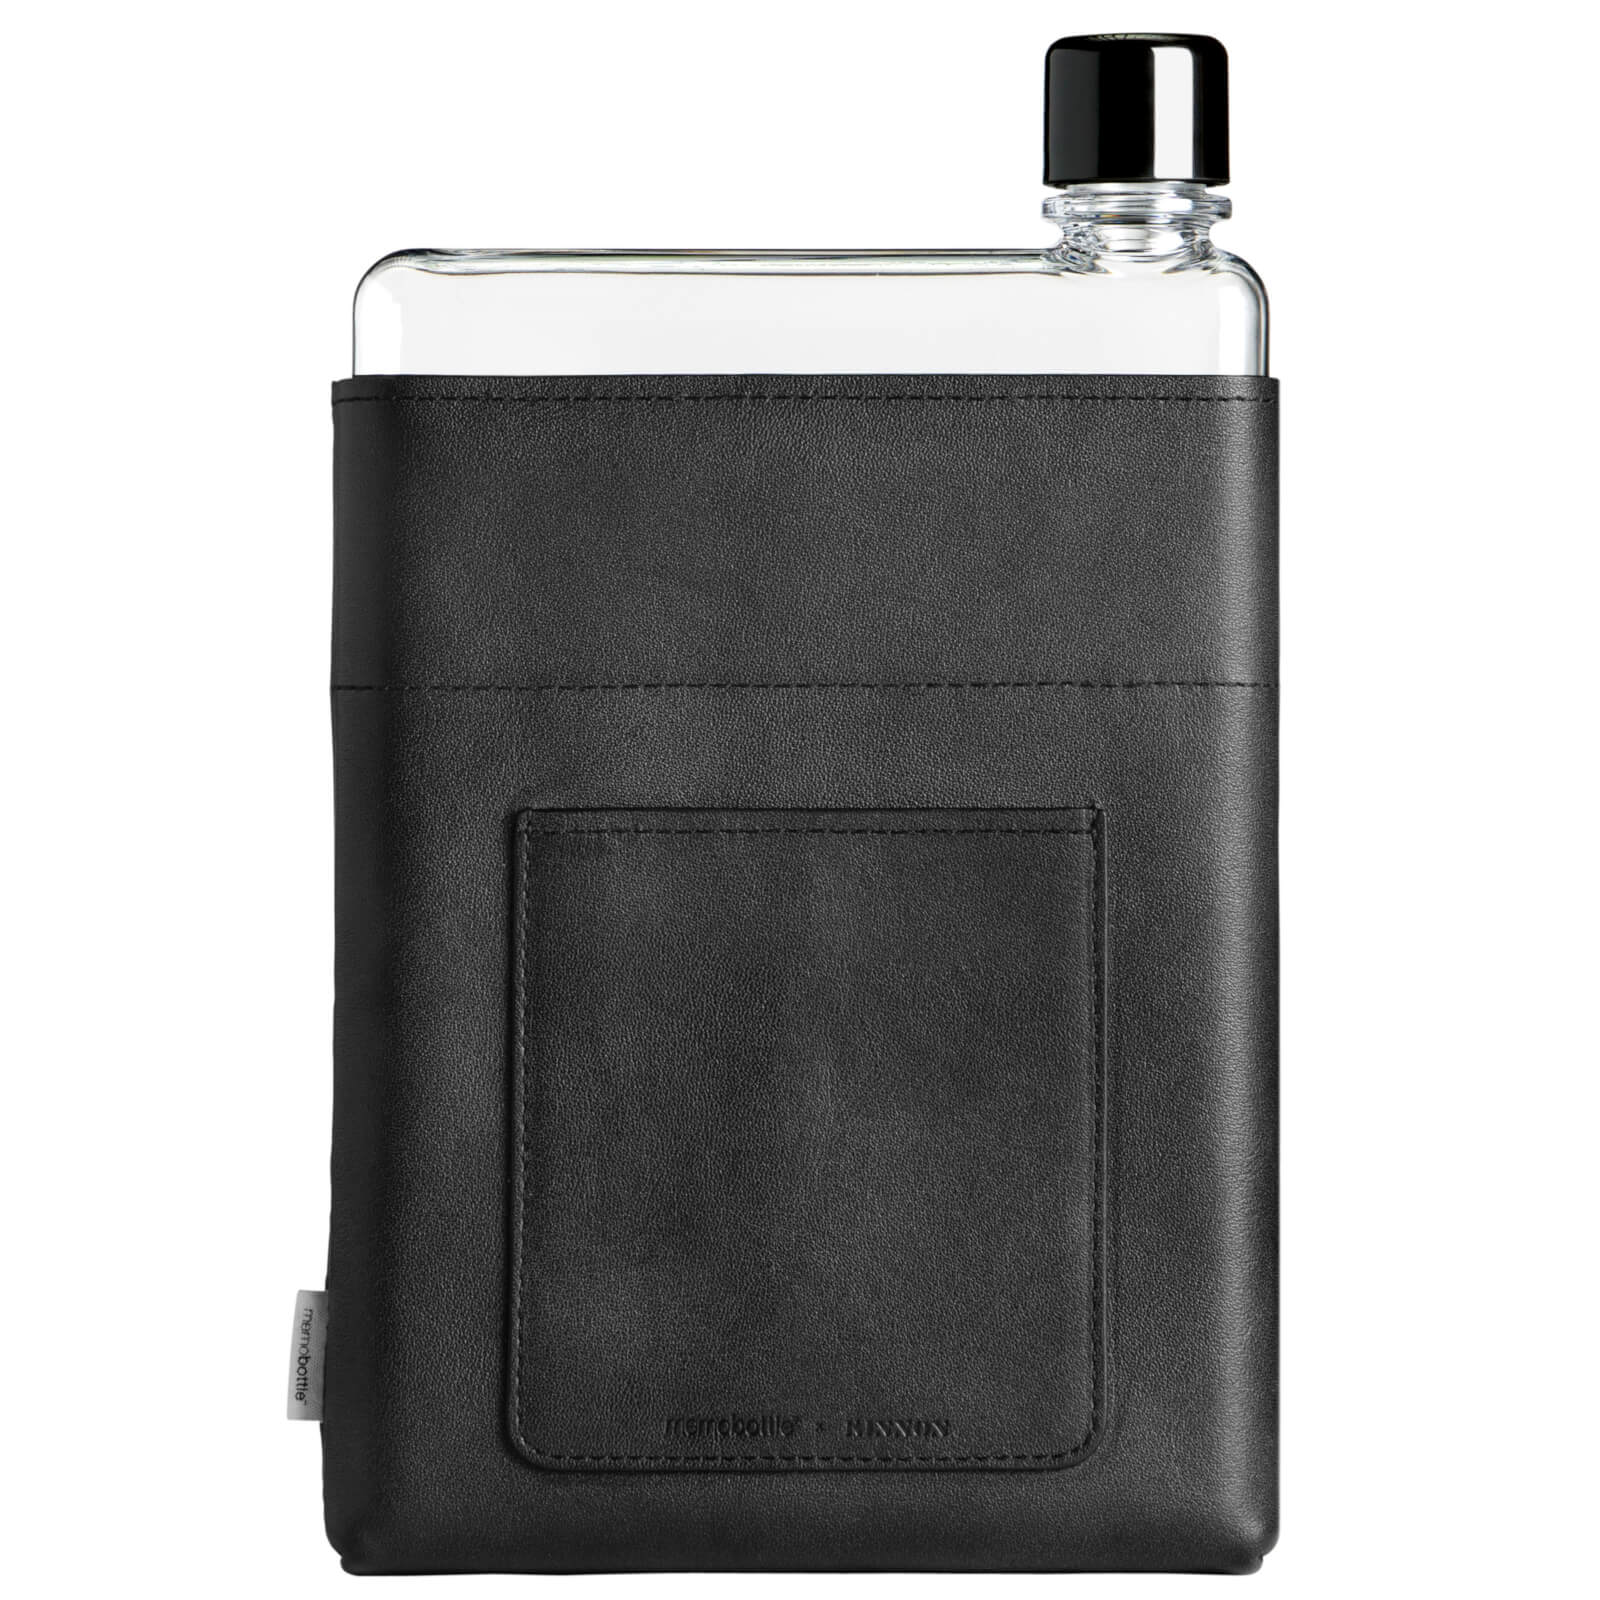 Memobottle A5 Vegan Leather Sleeve - Black